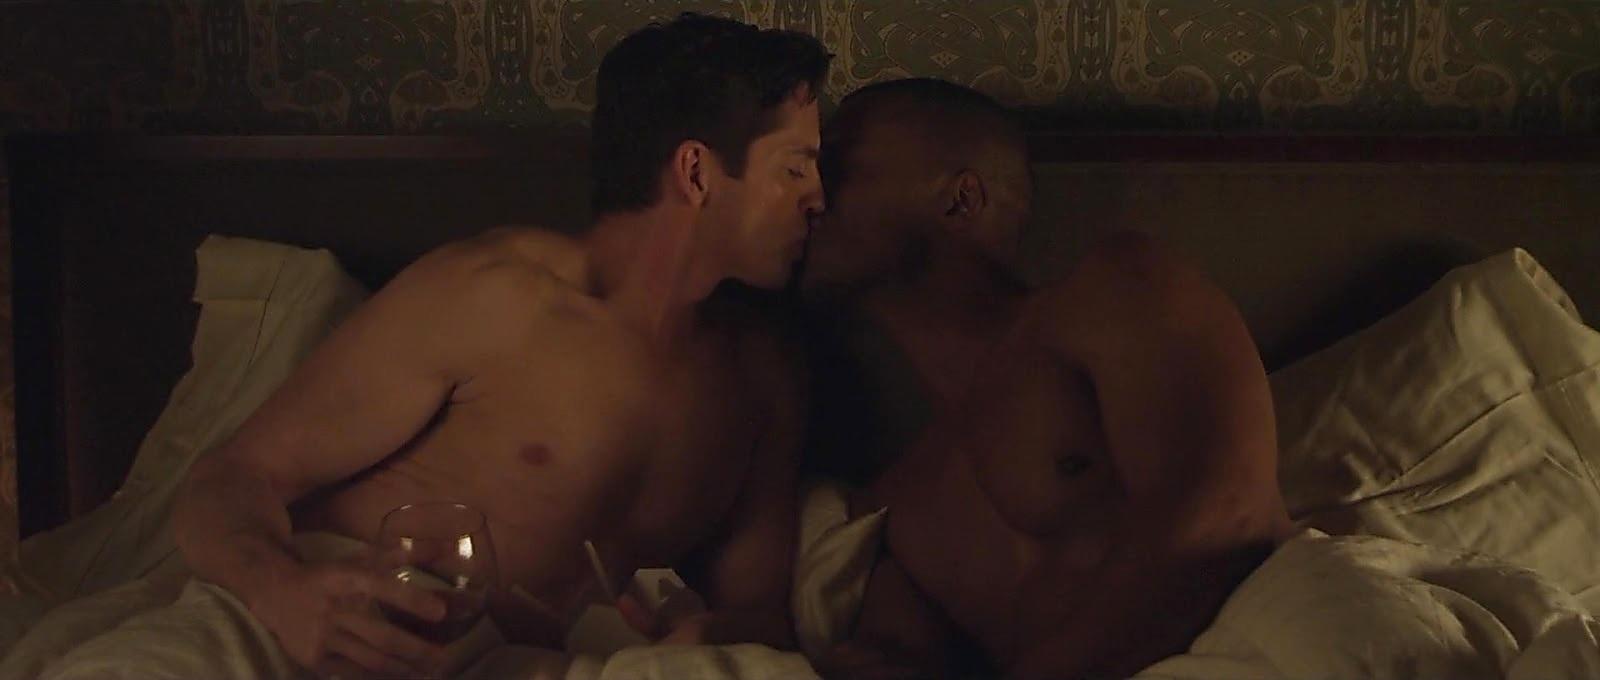 Darryl Stephens sexy shirtless scene March 29, 2020, 10am